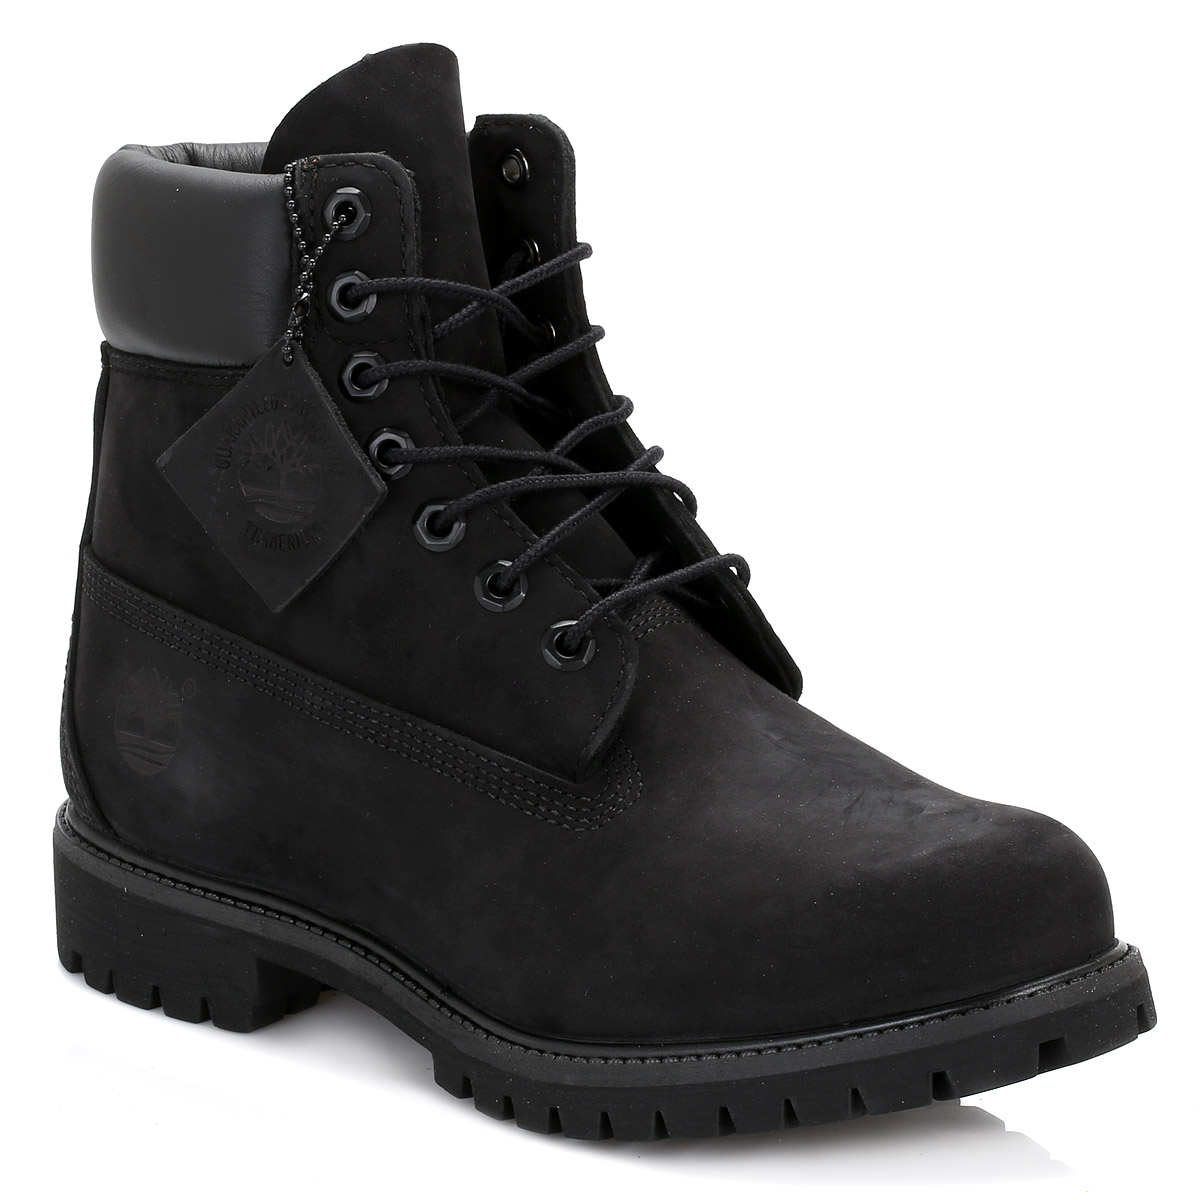 Timberland Black Nubuck Shoes